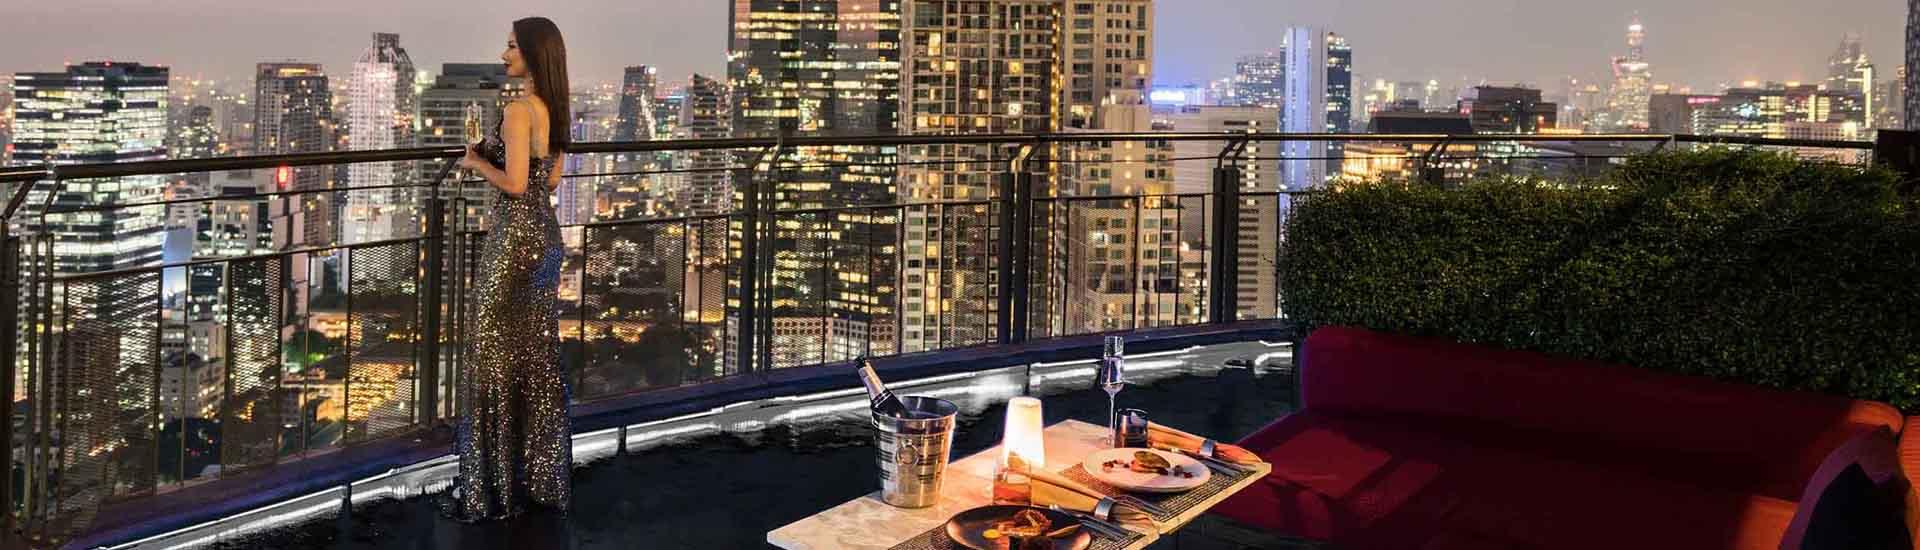 Hotel W Bangkok Booking